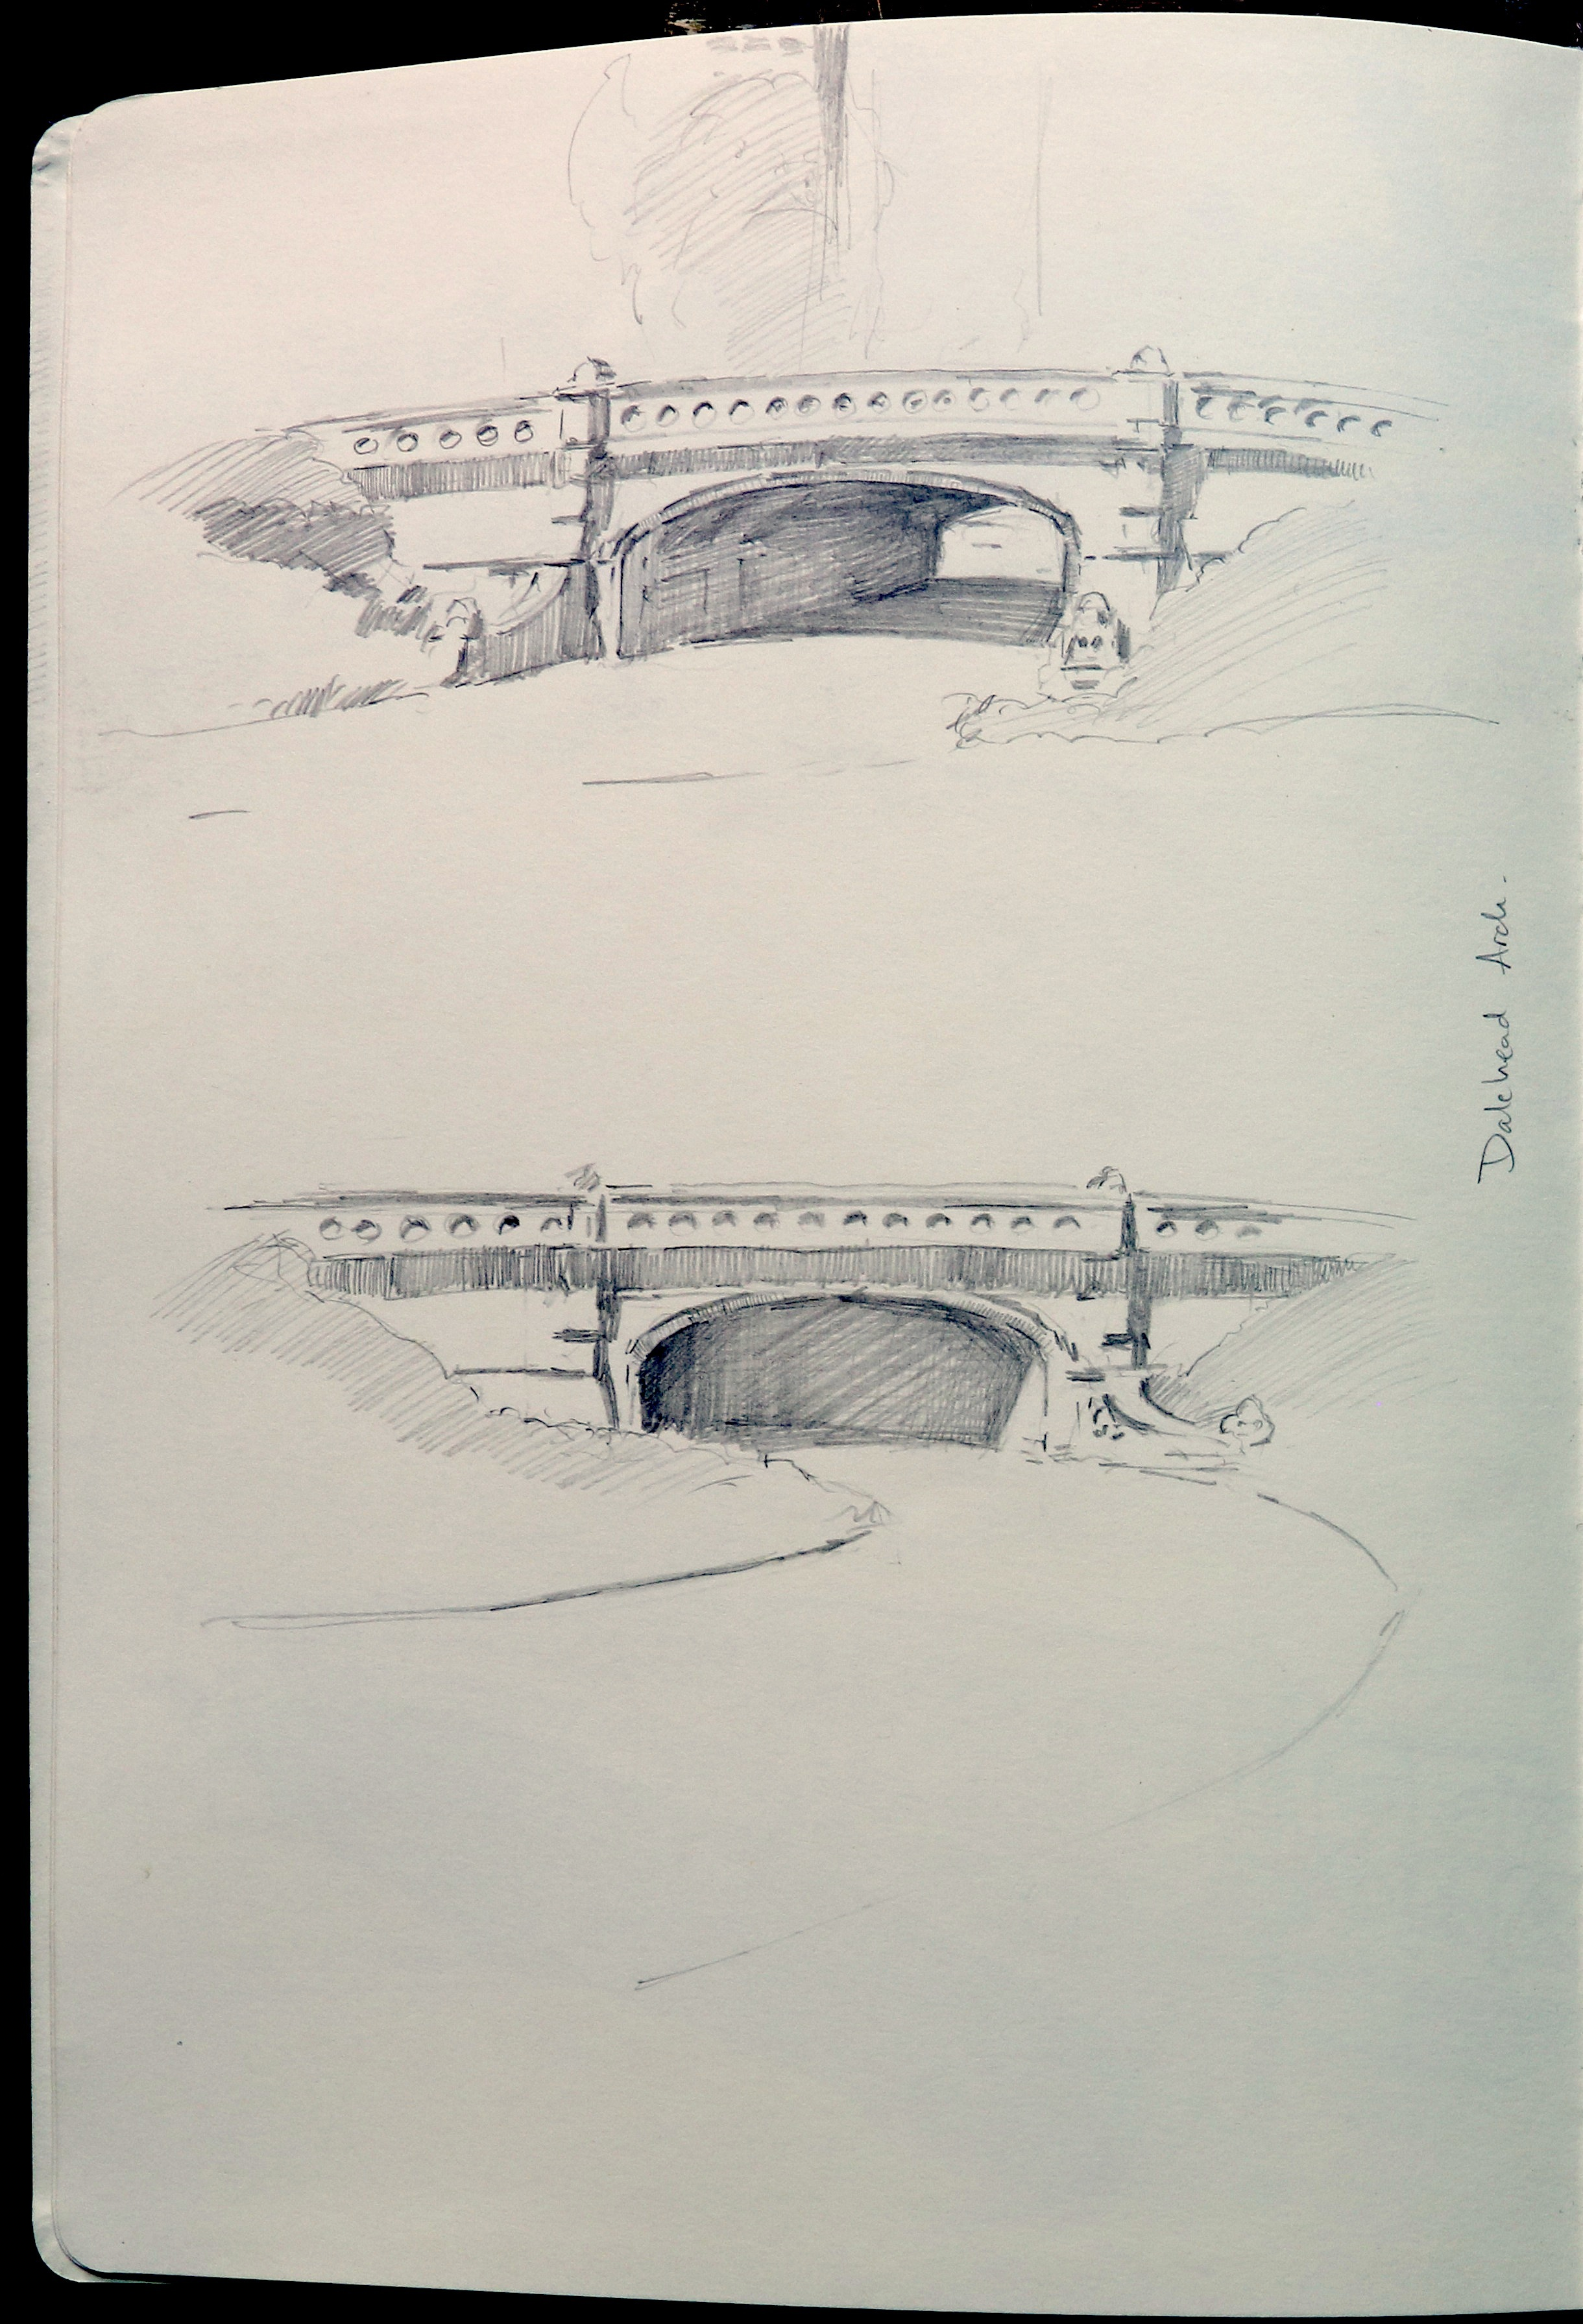 DALEWOOD ARCH . Built 1860 - 1862 by Calvert Vaux. Stone arch vehicle bridge.